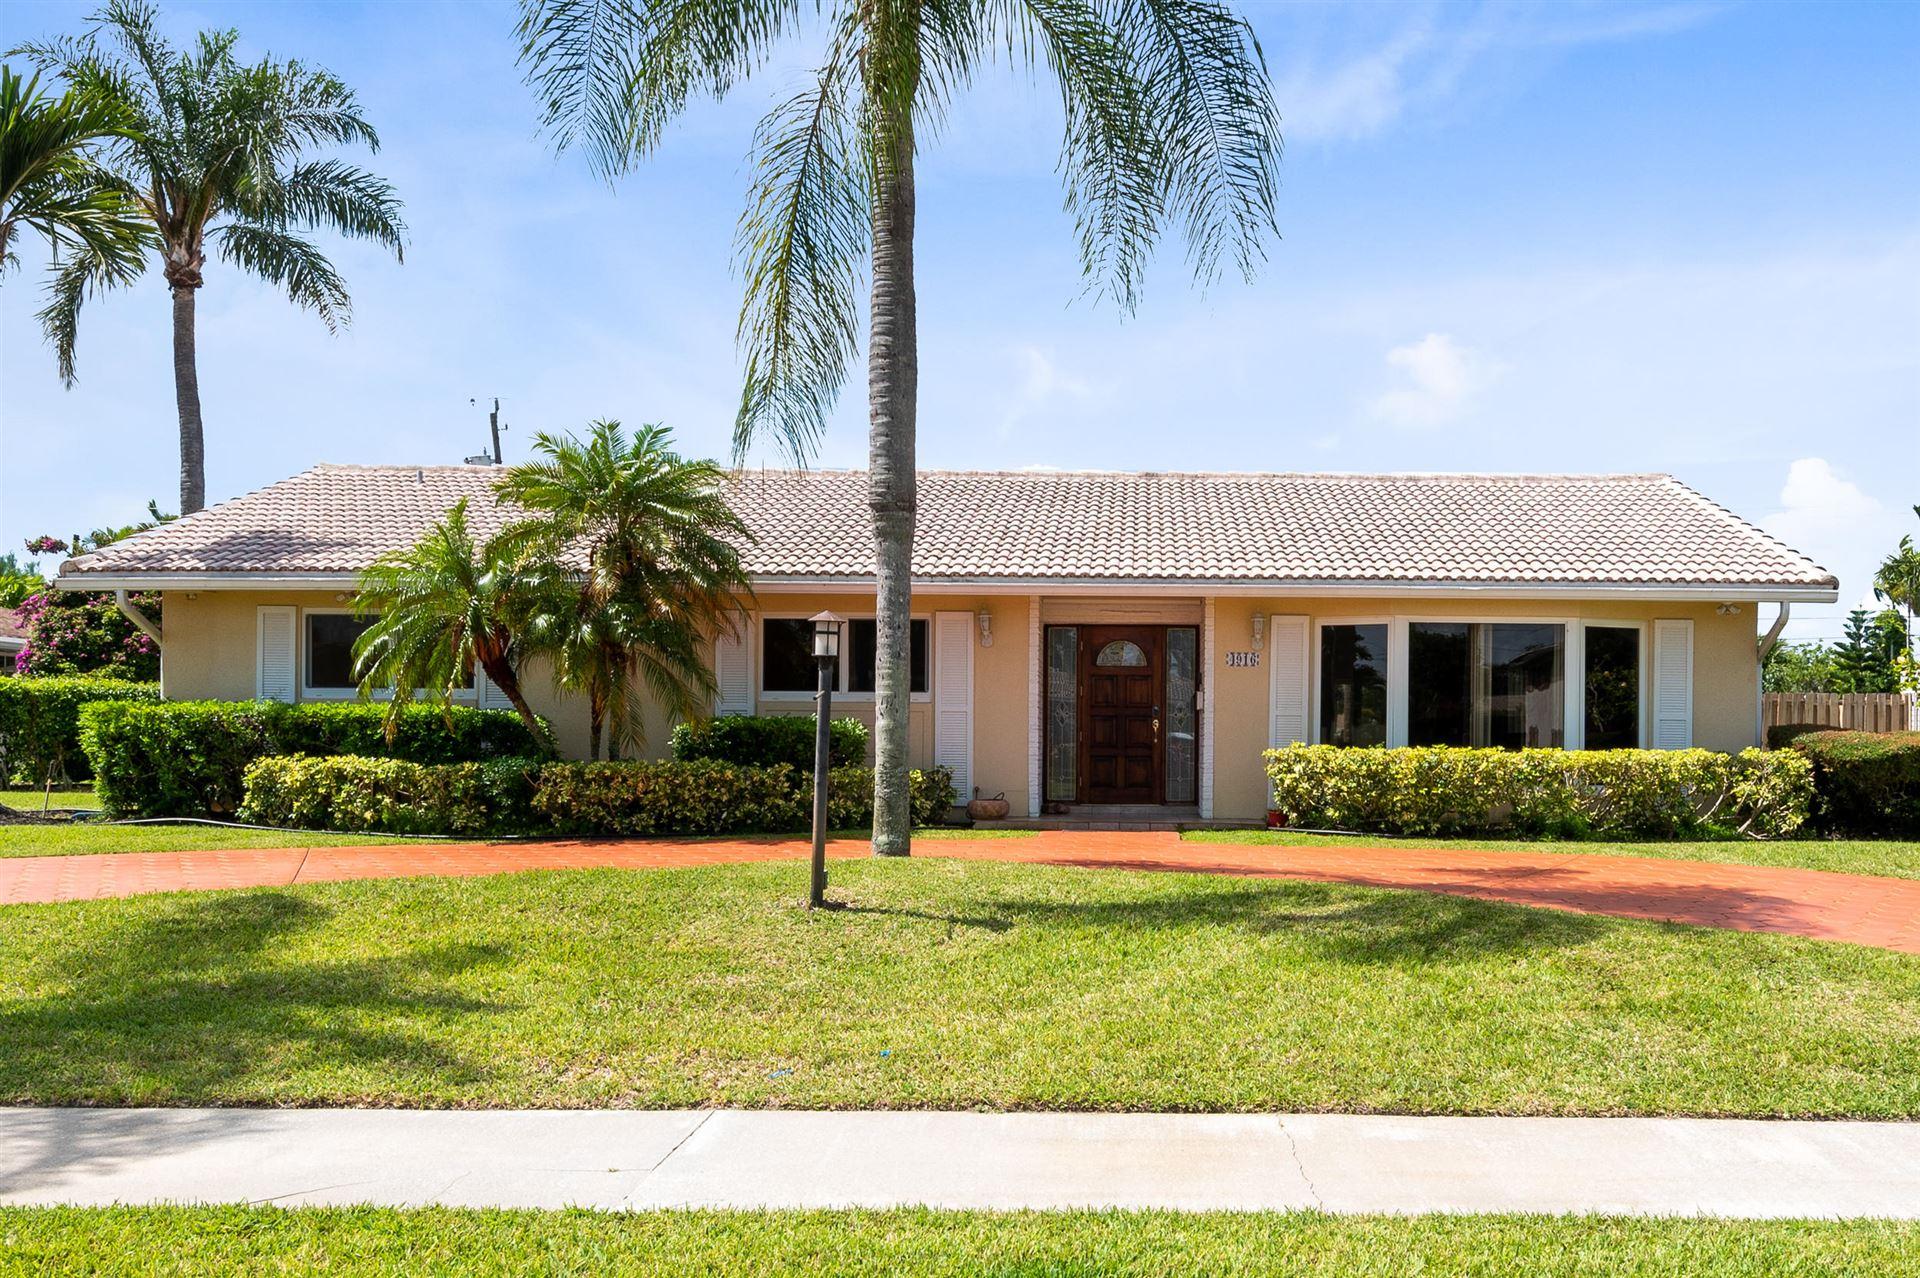 4916 Buchanan Street, Hollywood, FL 33021 - MLS#: RX-10722558